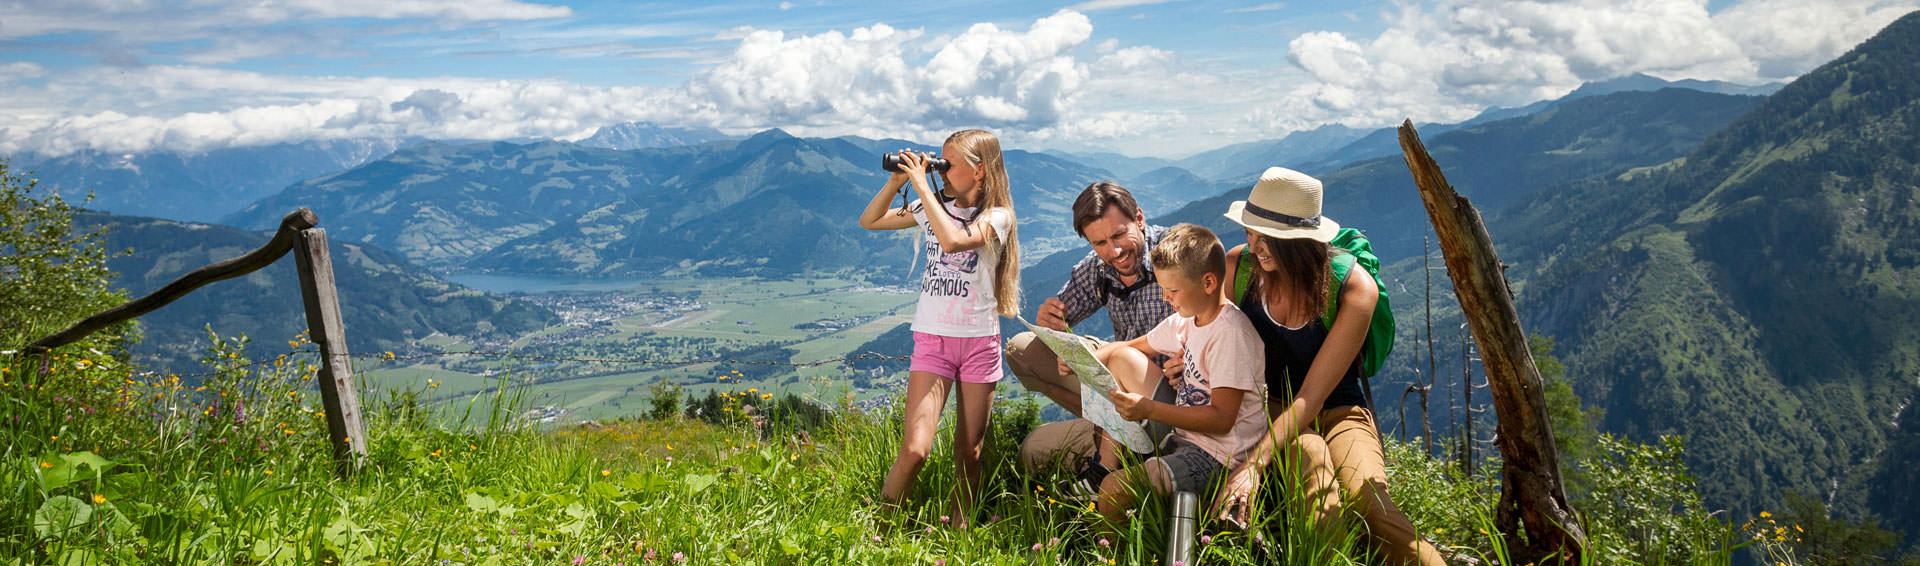 Familien wandert in den Bergen